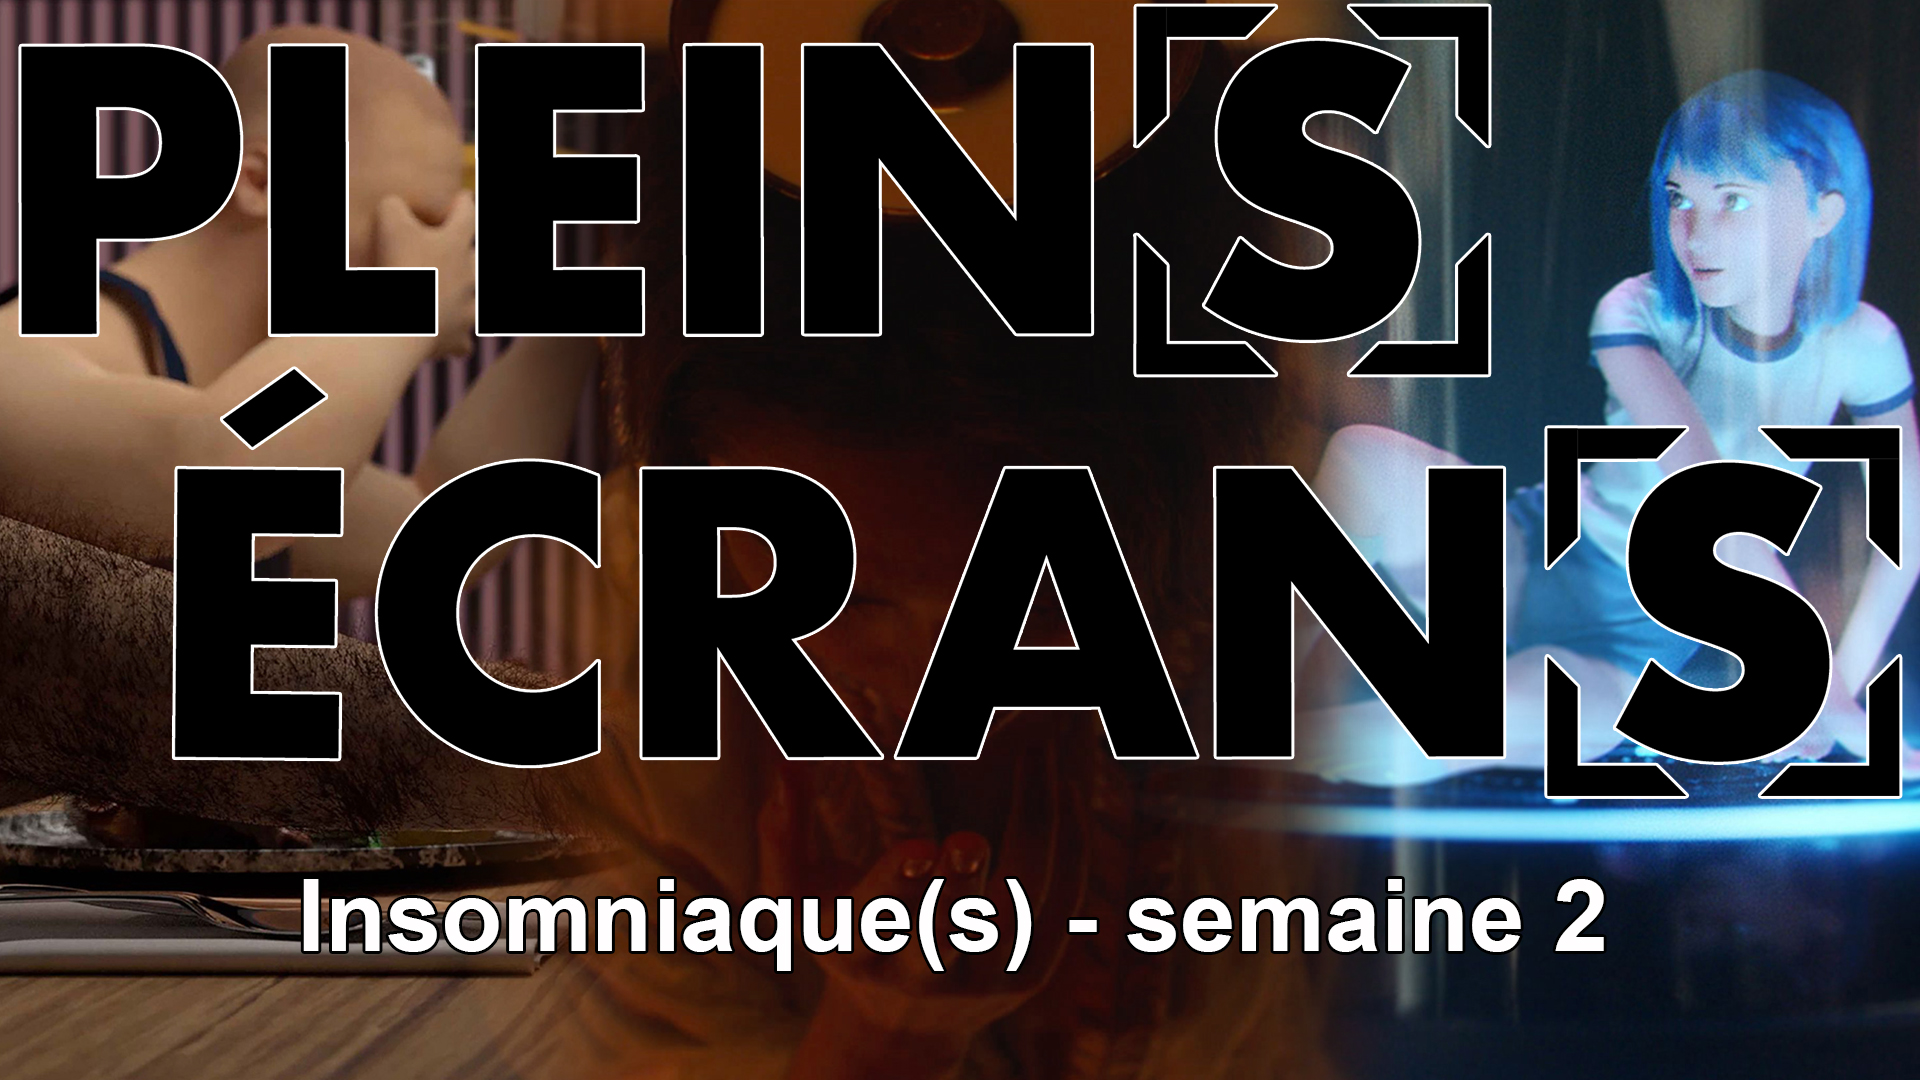 Plein[s] Écran[s] 2021 – Insomniac[s] week 2